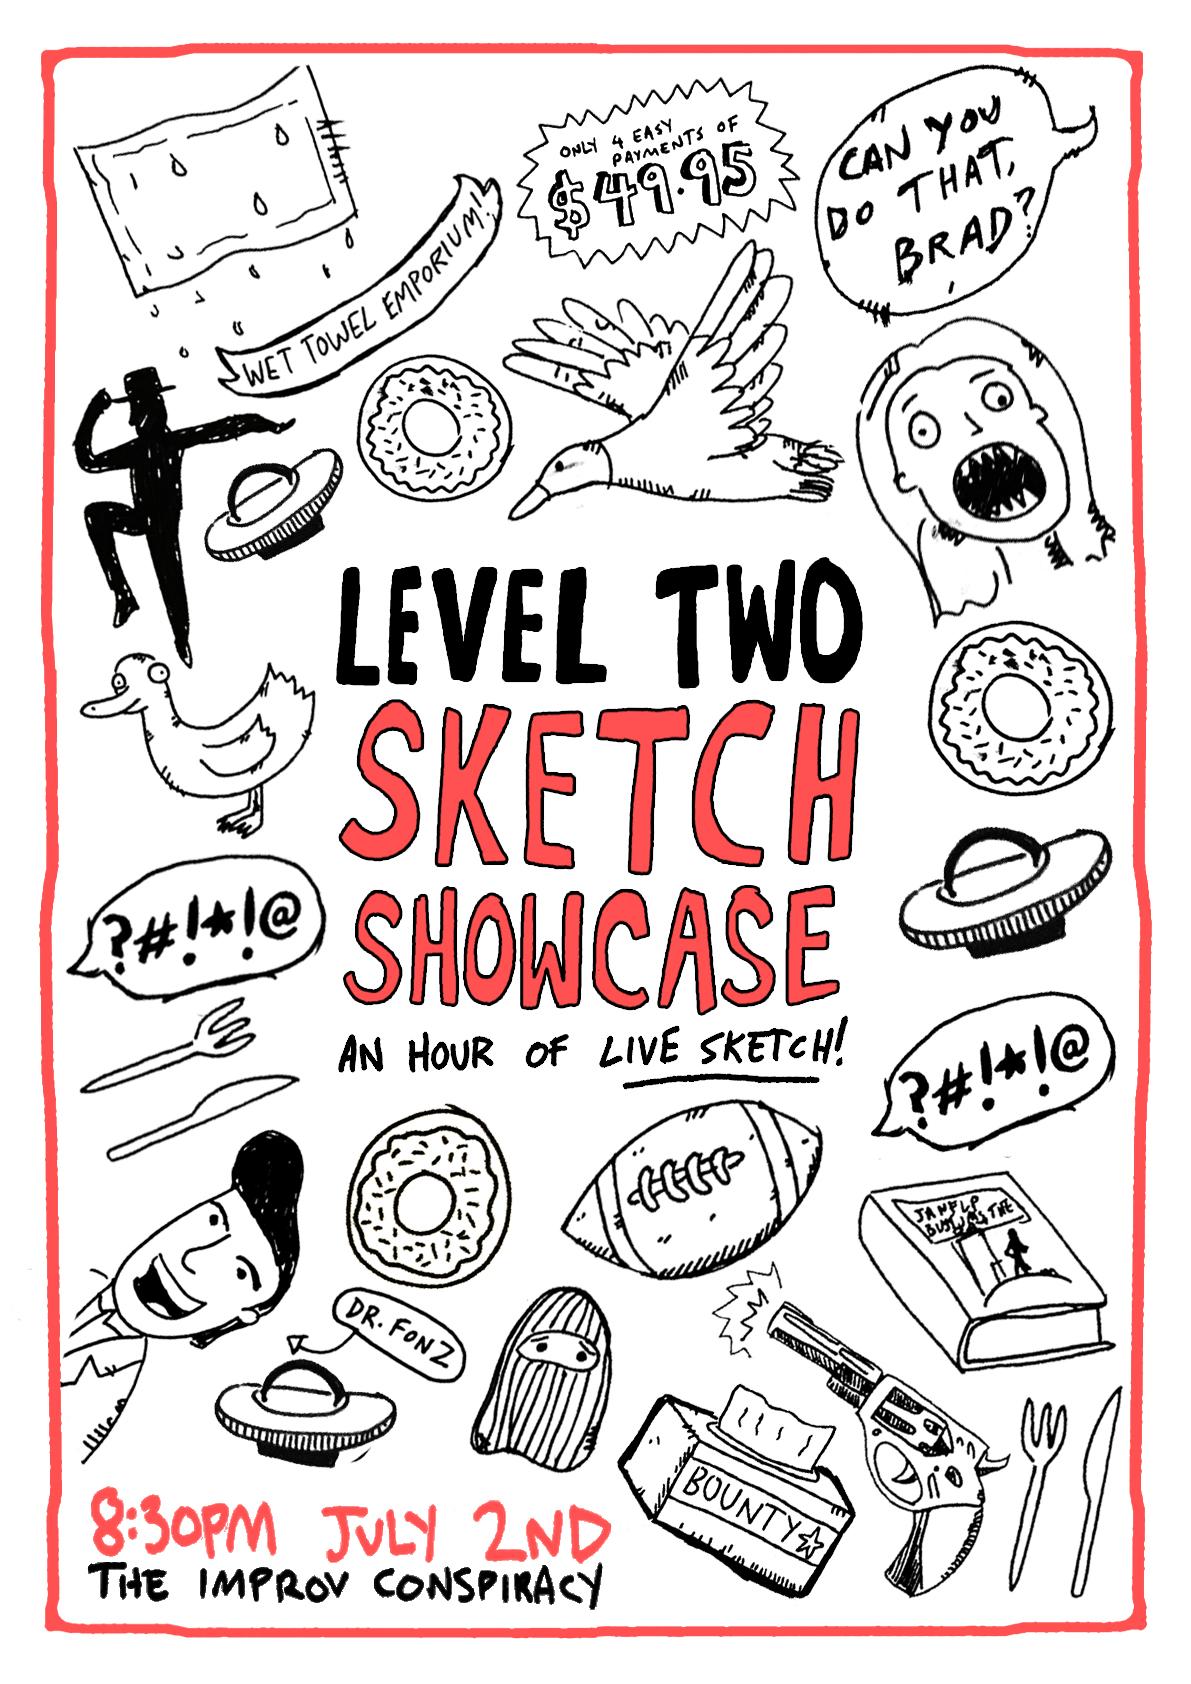 L2 Sketch Showcase    | Sketch show poster